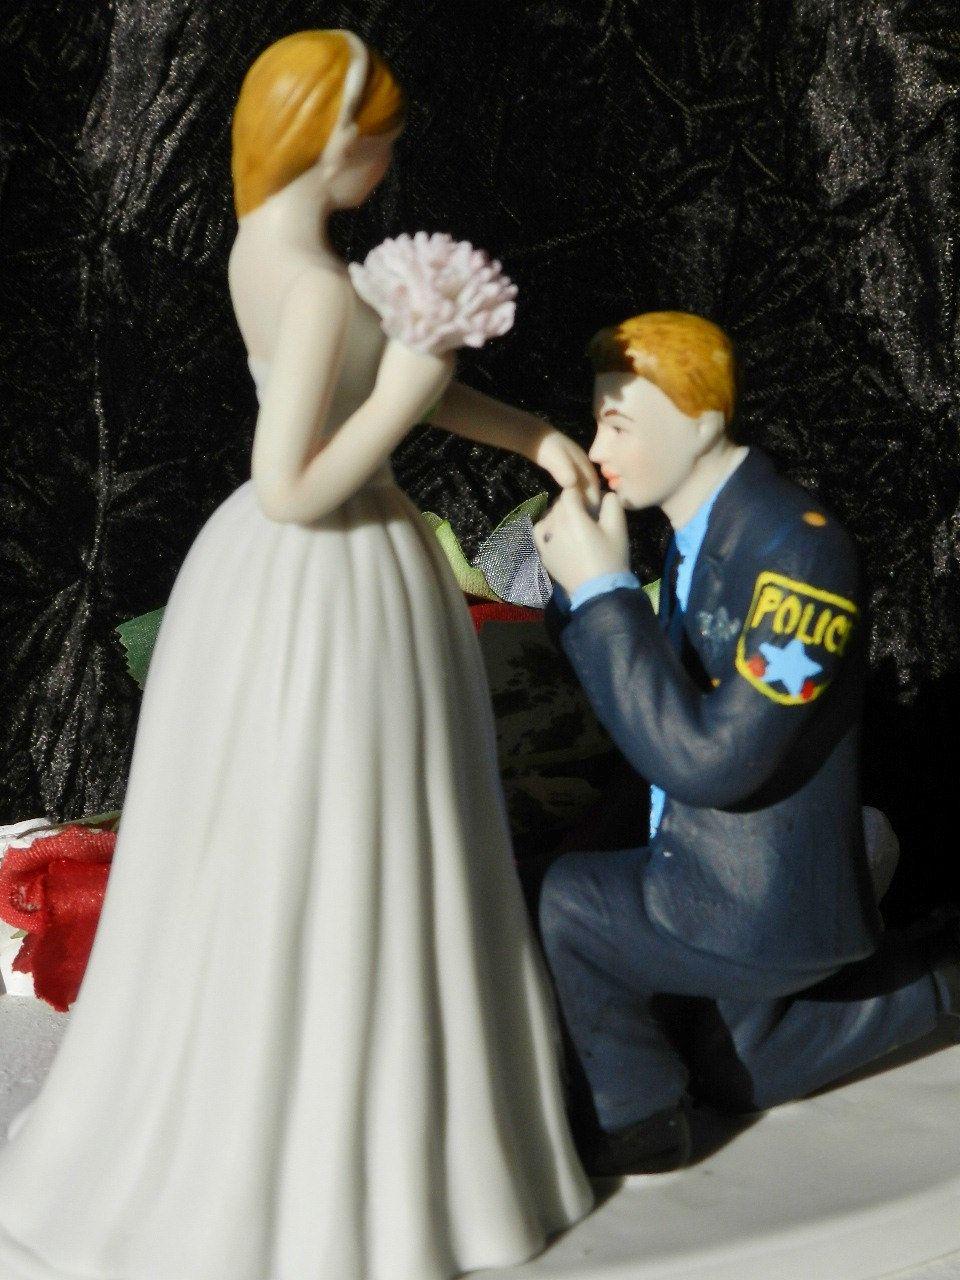 Police Officer Cop Groom Kiss Bride Hand Wedding Cake Topper KNEEL